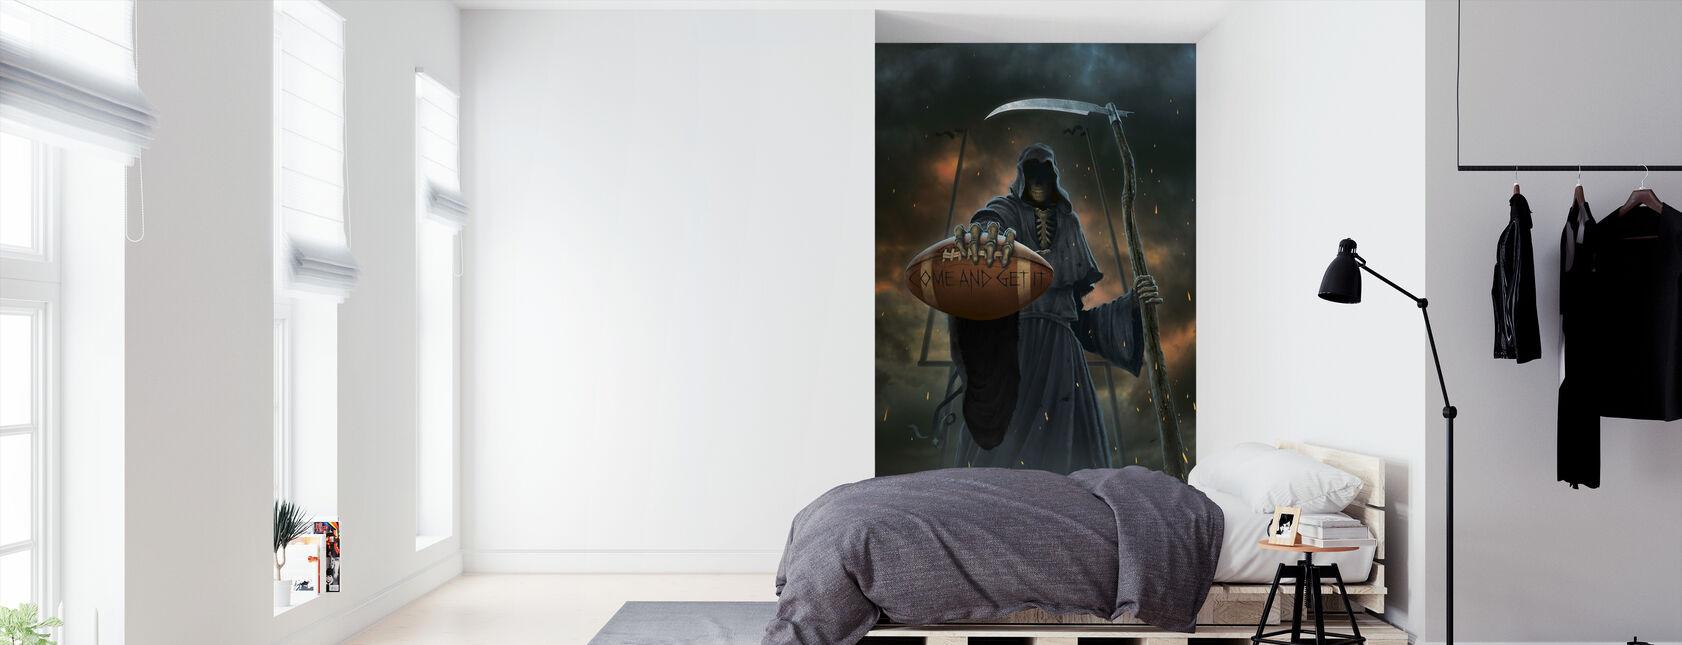 Come and Get It - Wallpaper - Bedroom